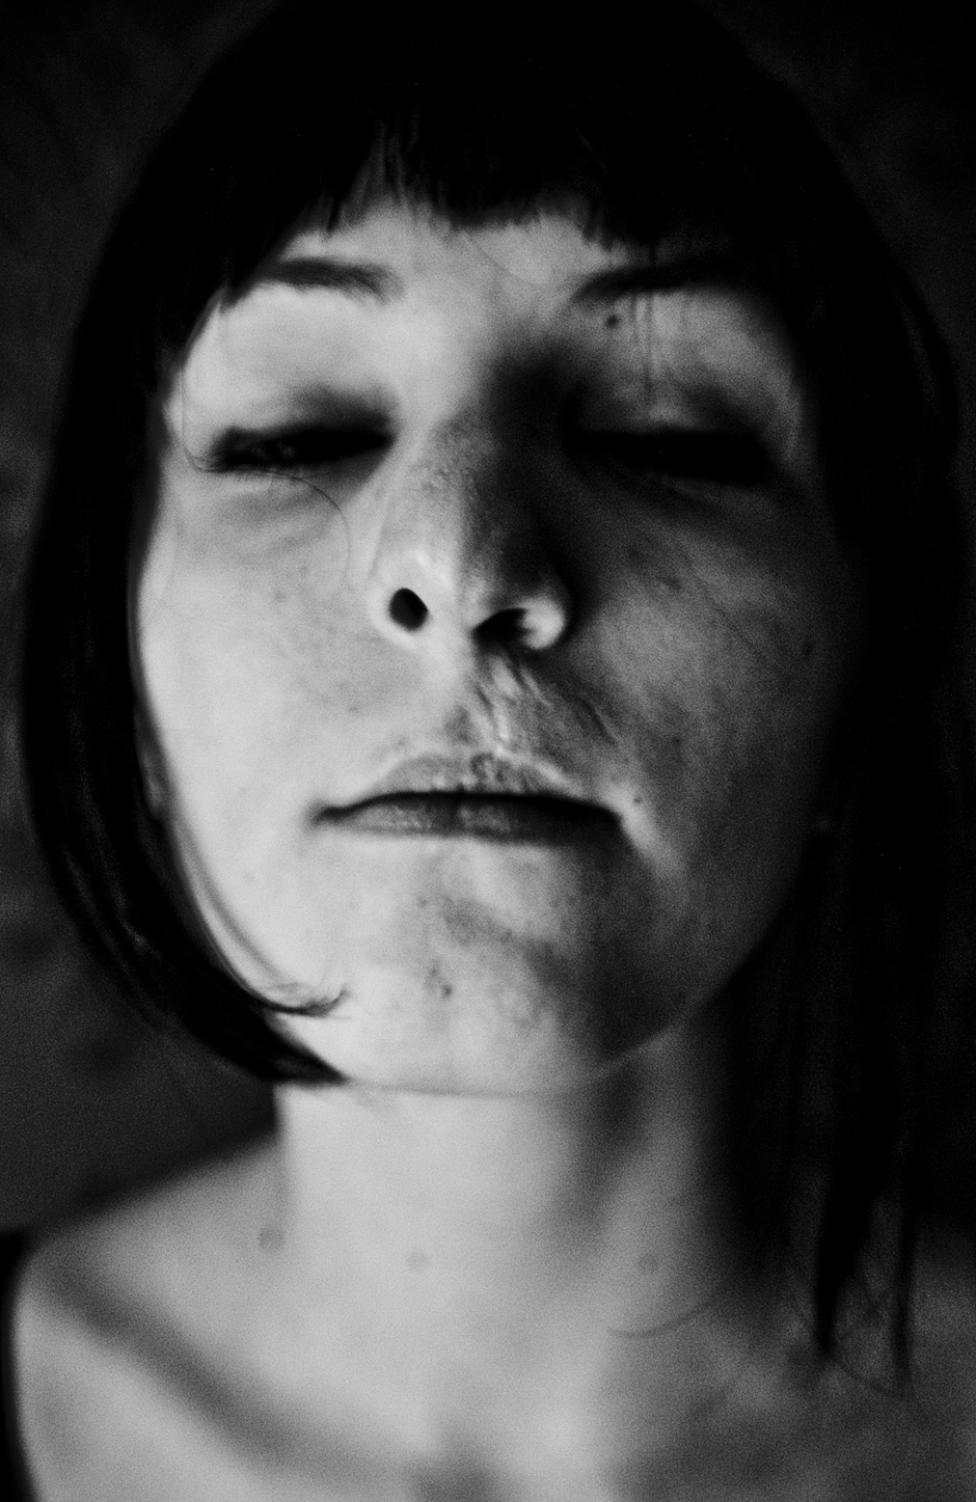 Fra serien 'Womanity' © Kajsa Gullberg